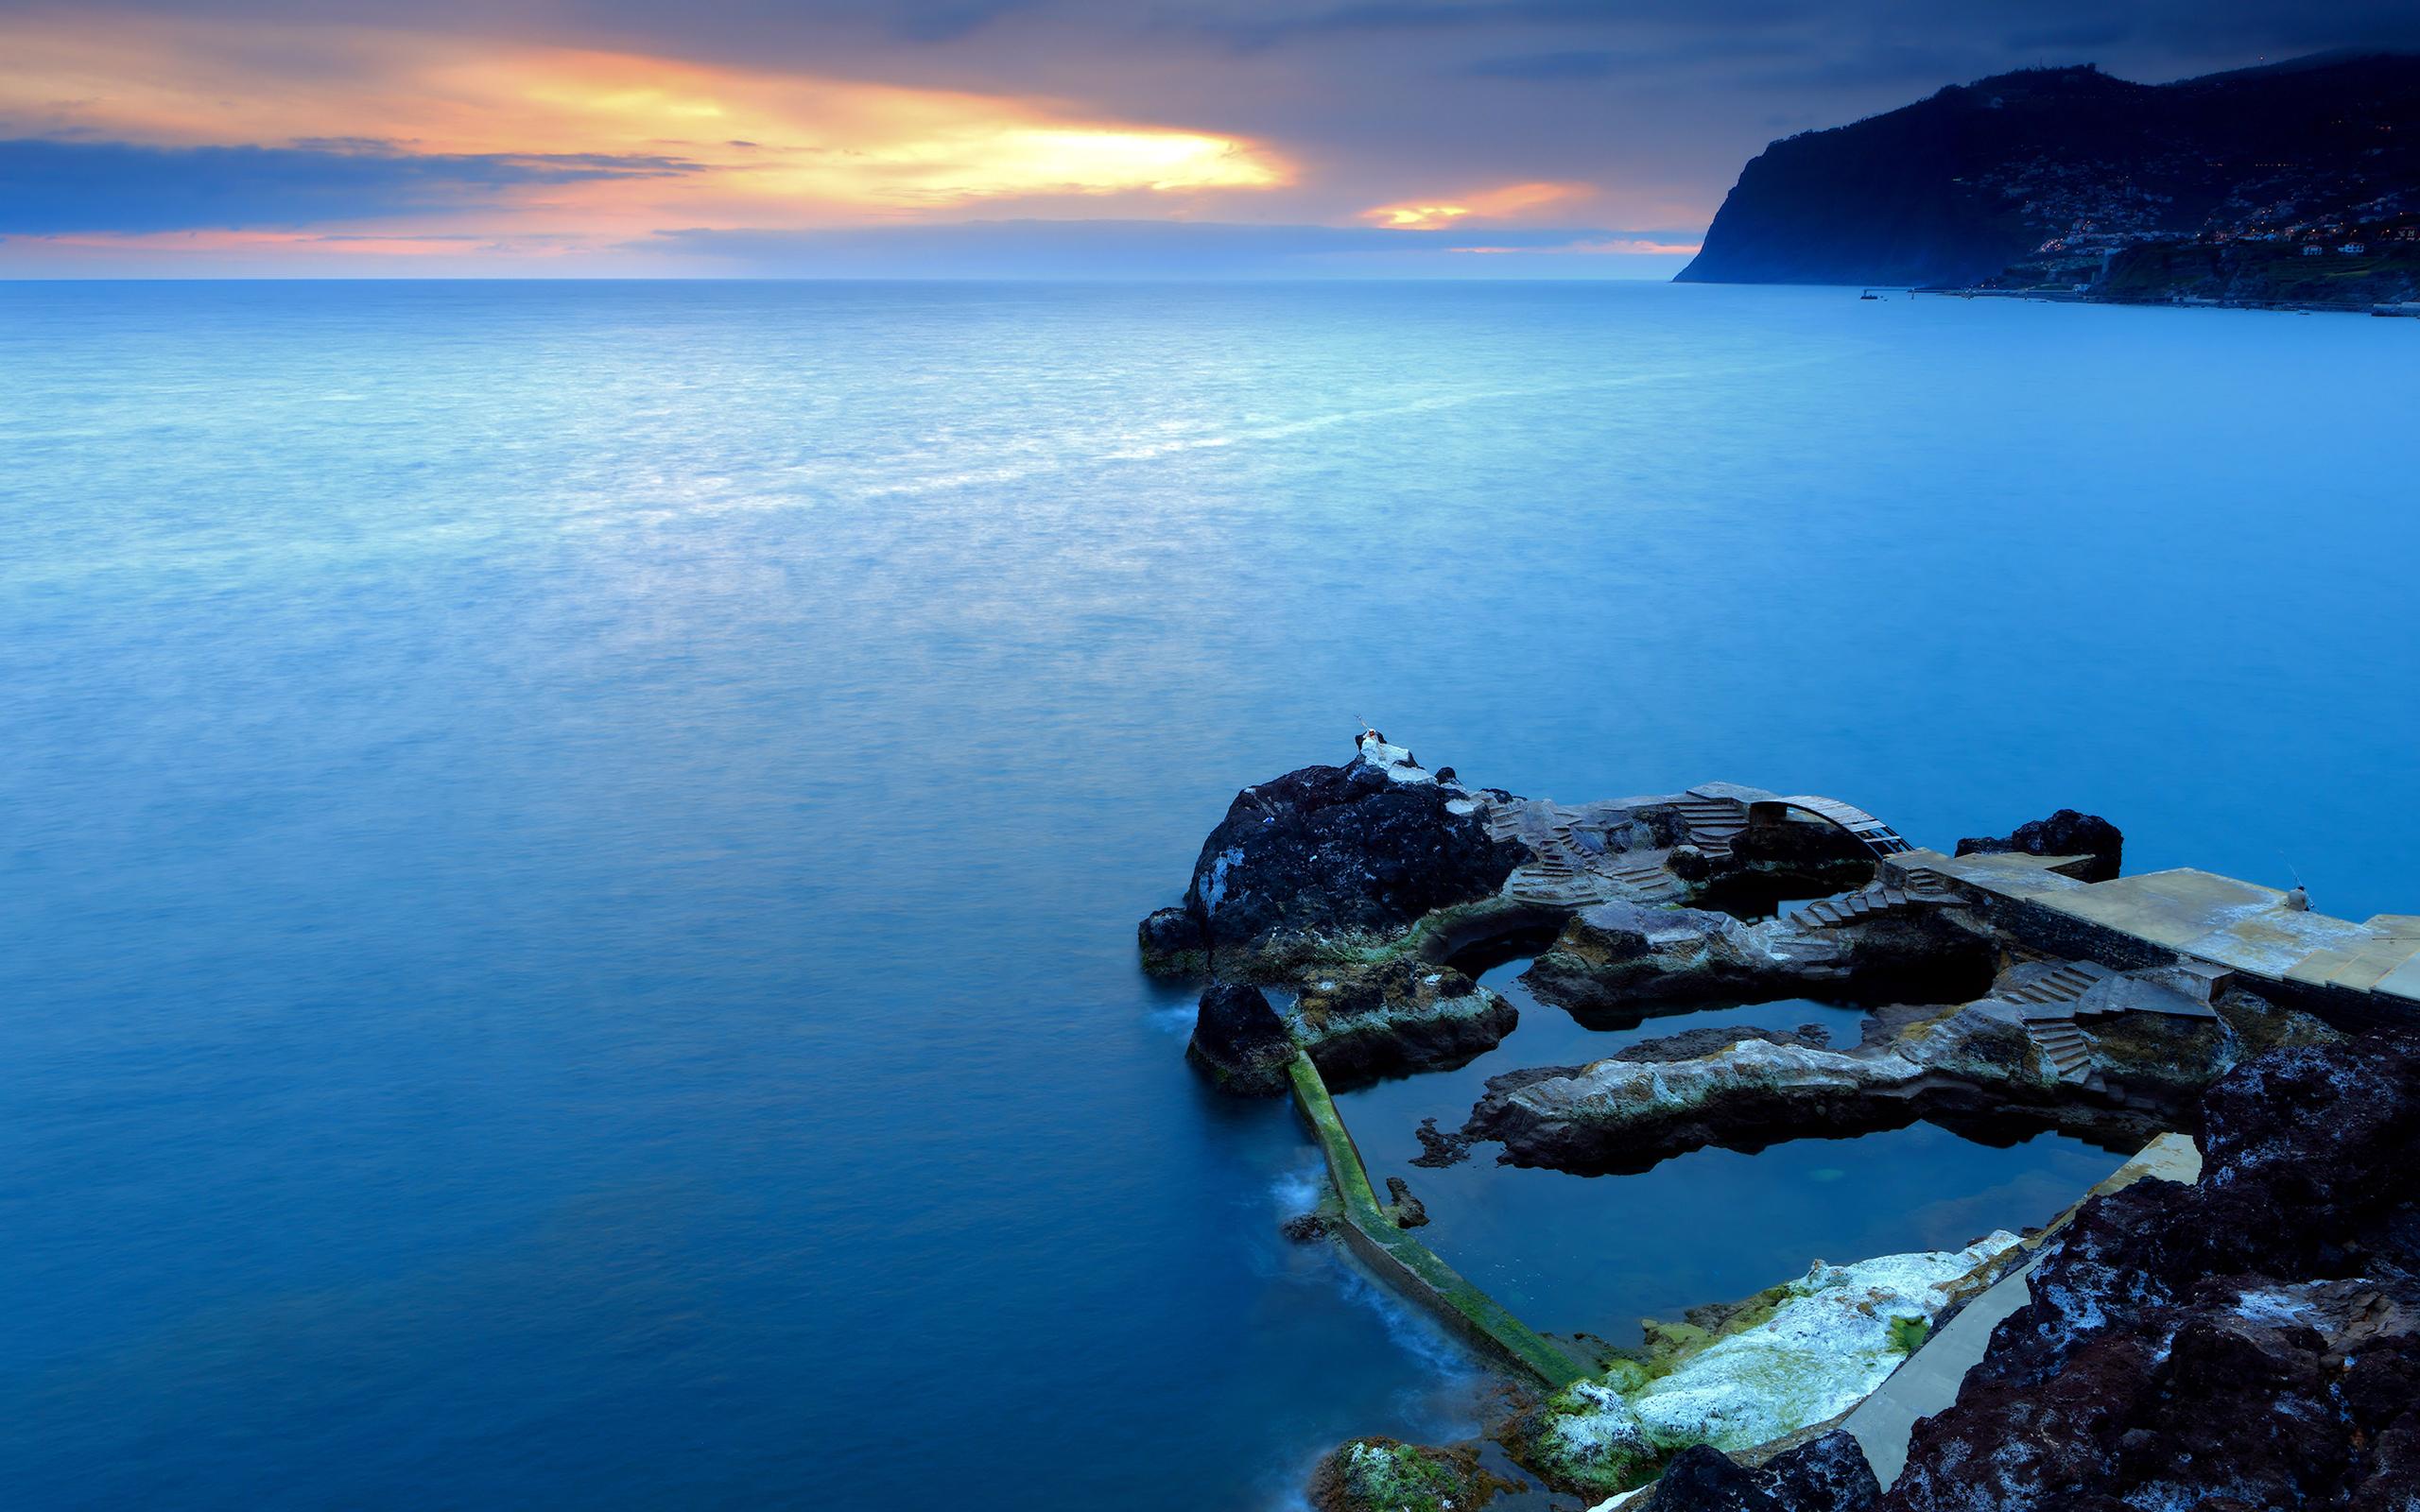 природа море скалы берег  № 2718649 загрузить